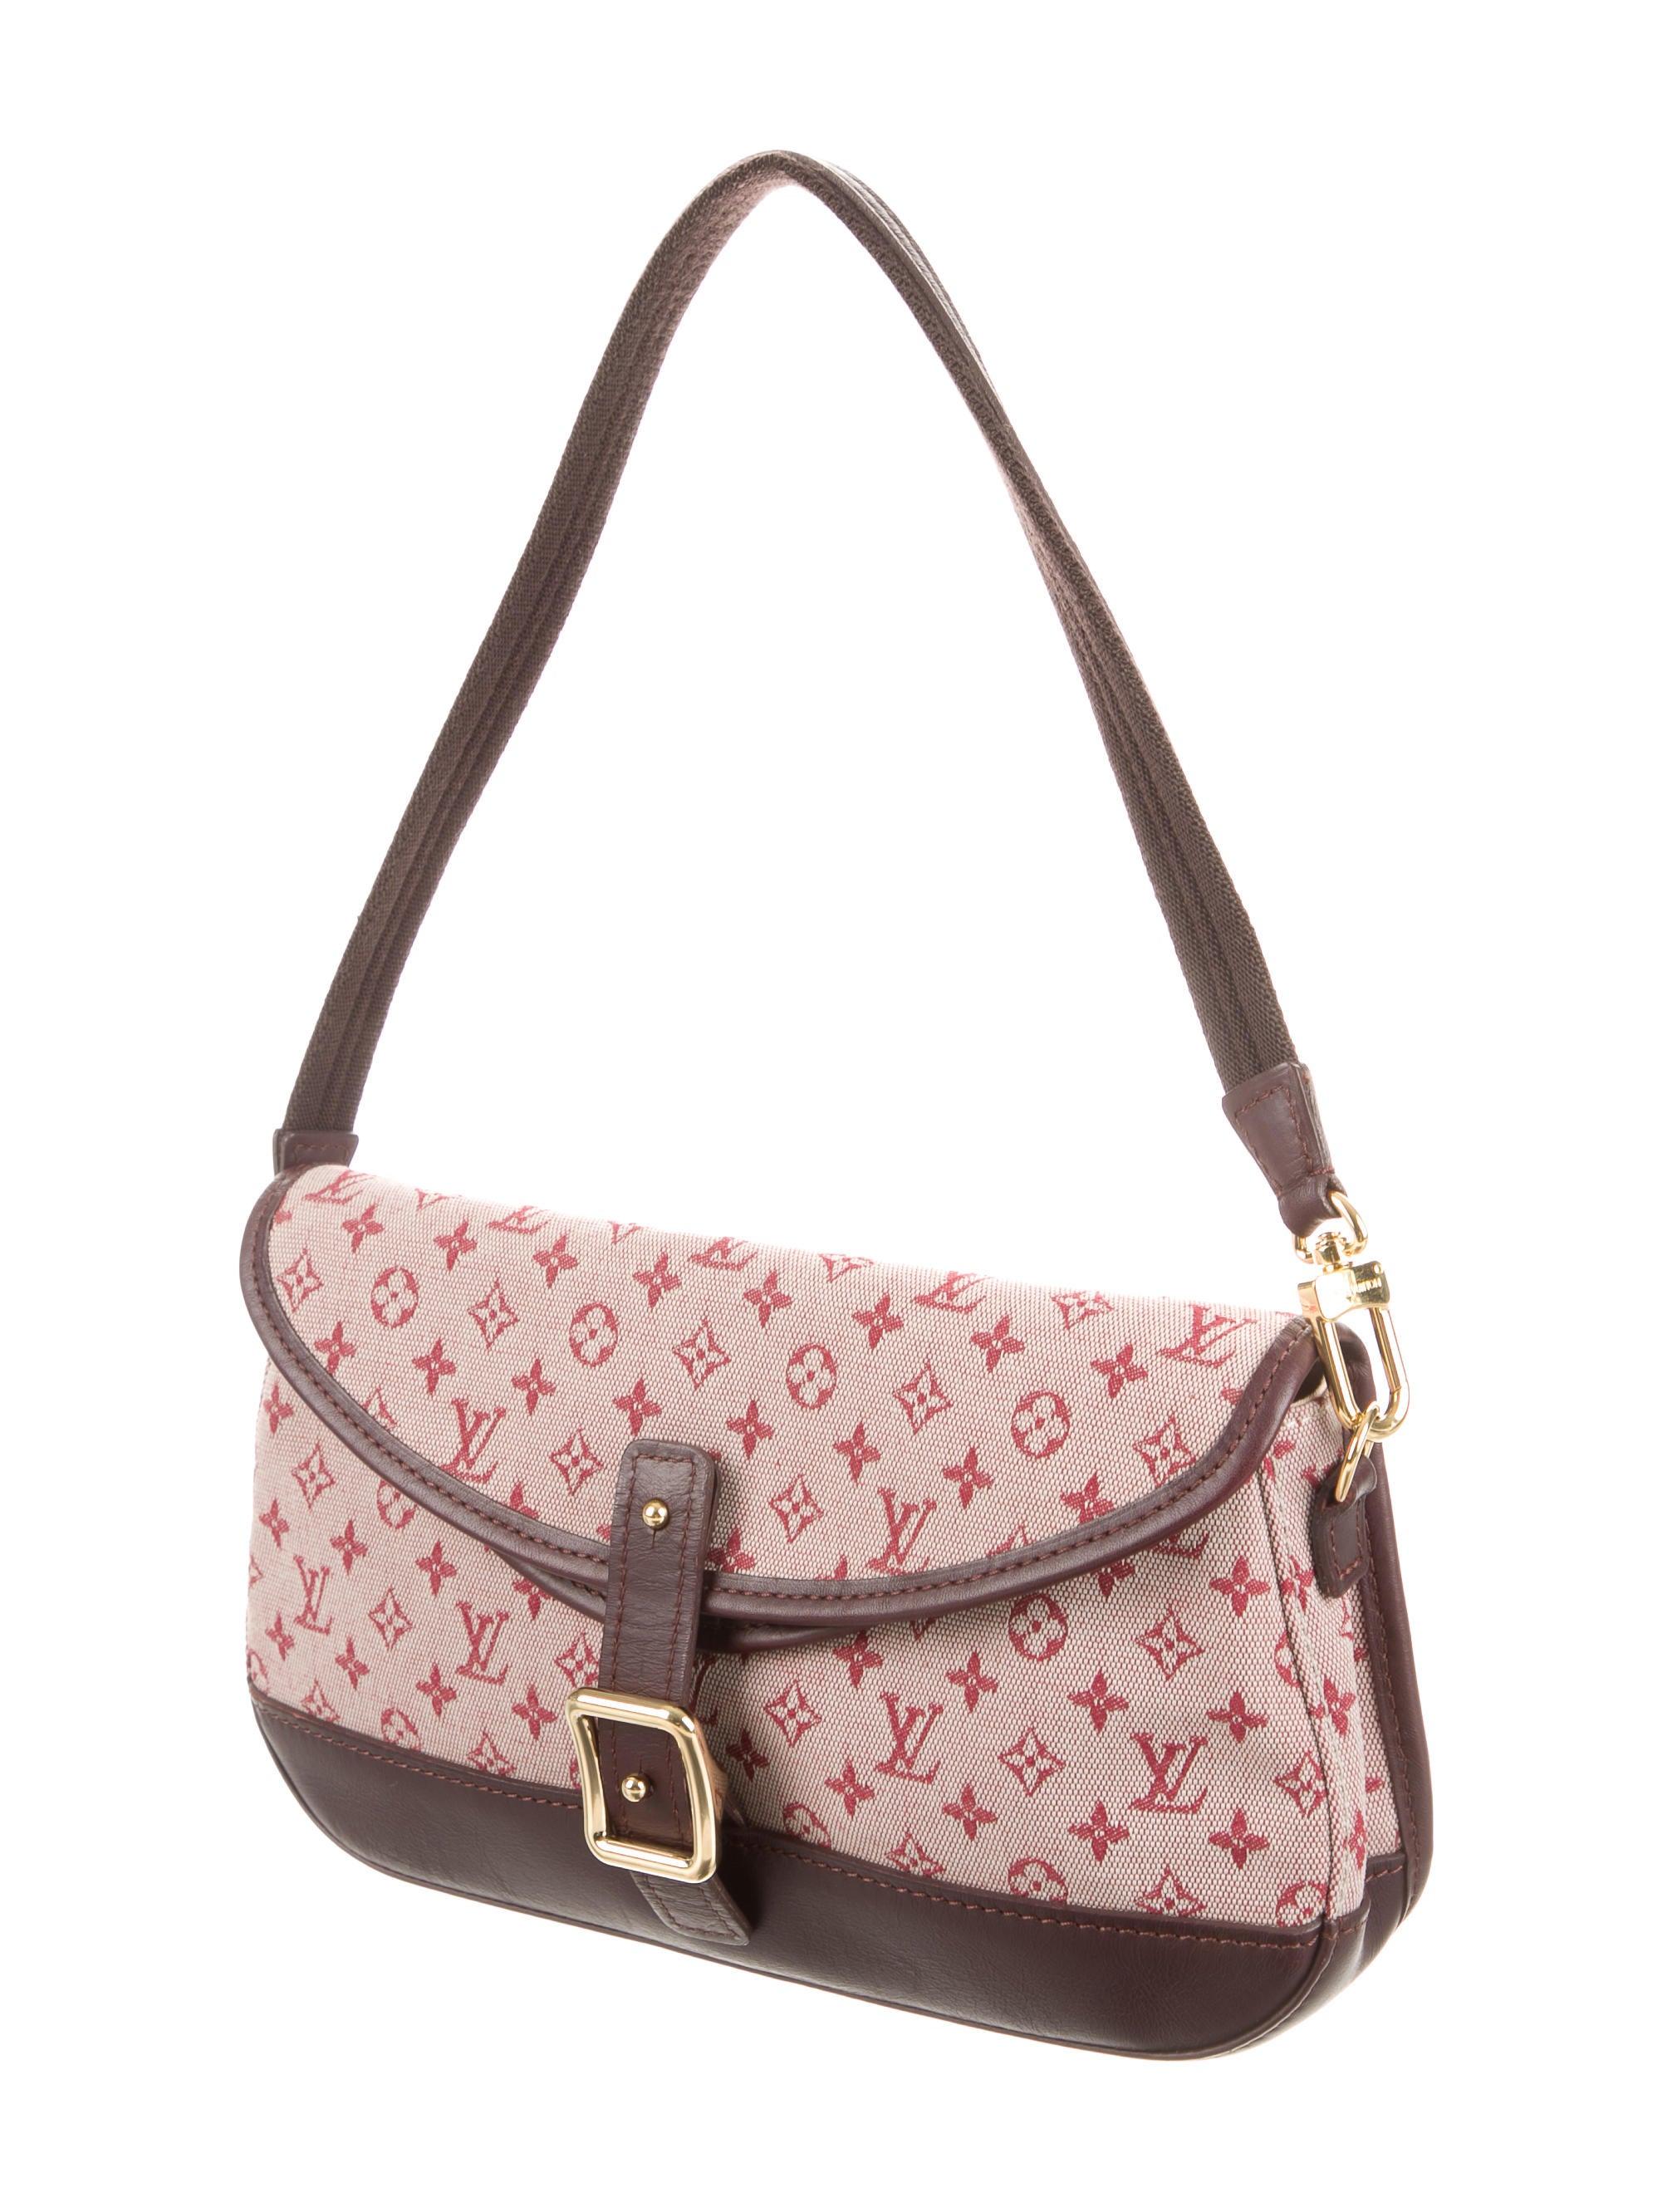 Louis vuitton mini lin marjorie bag handbags lou92260 for Louis vuitton miroir bags